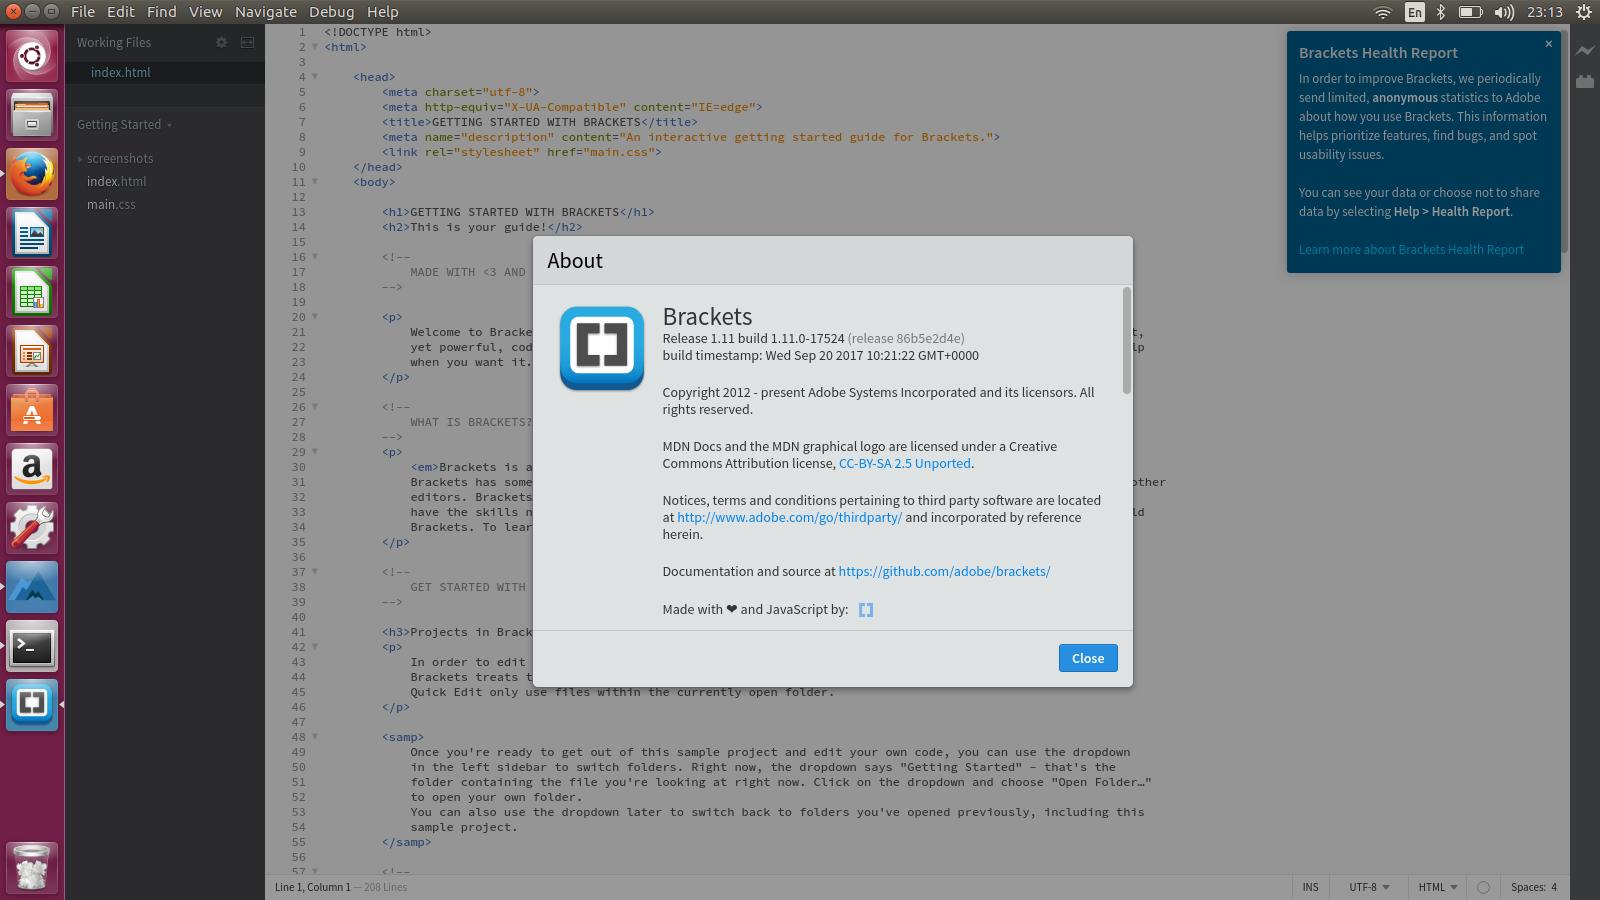 How to install program on Ubuntu: How to install Brackets 1 11 on